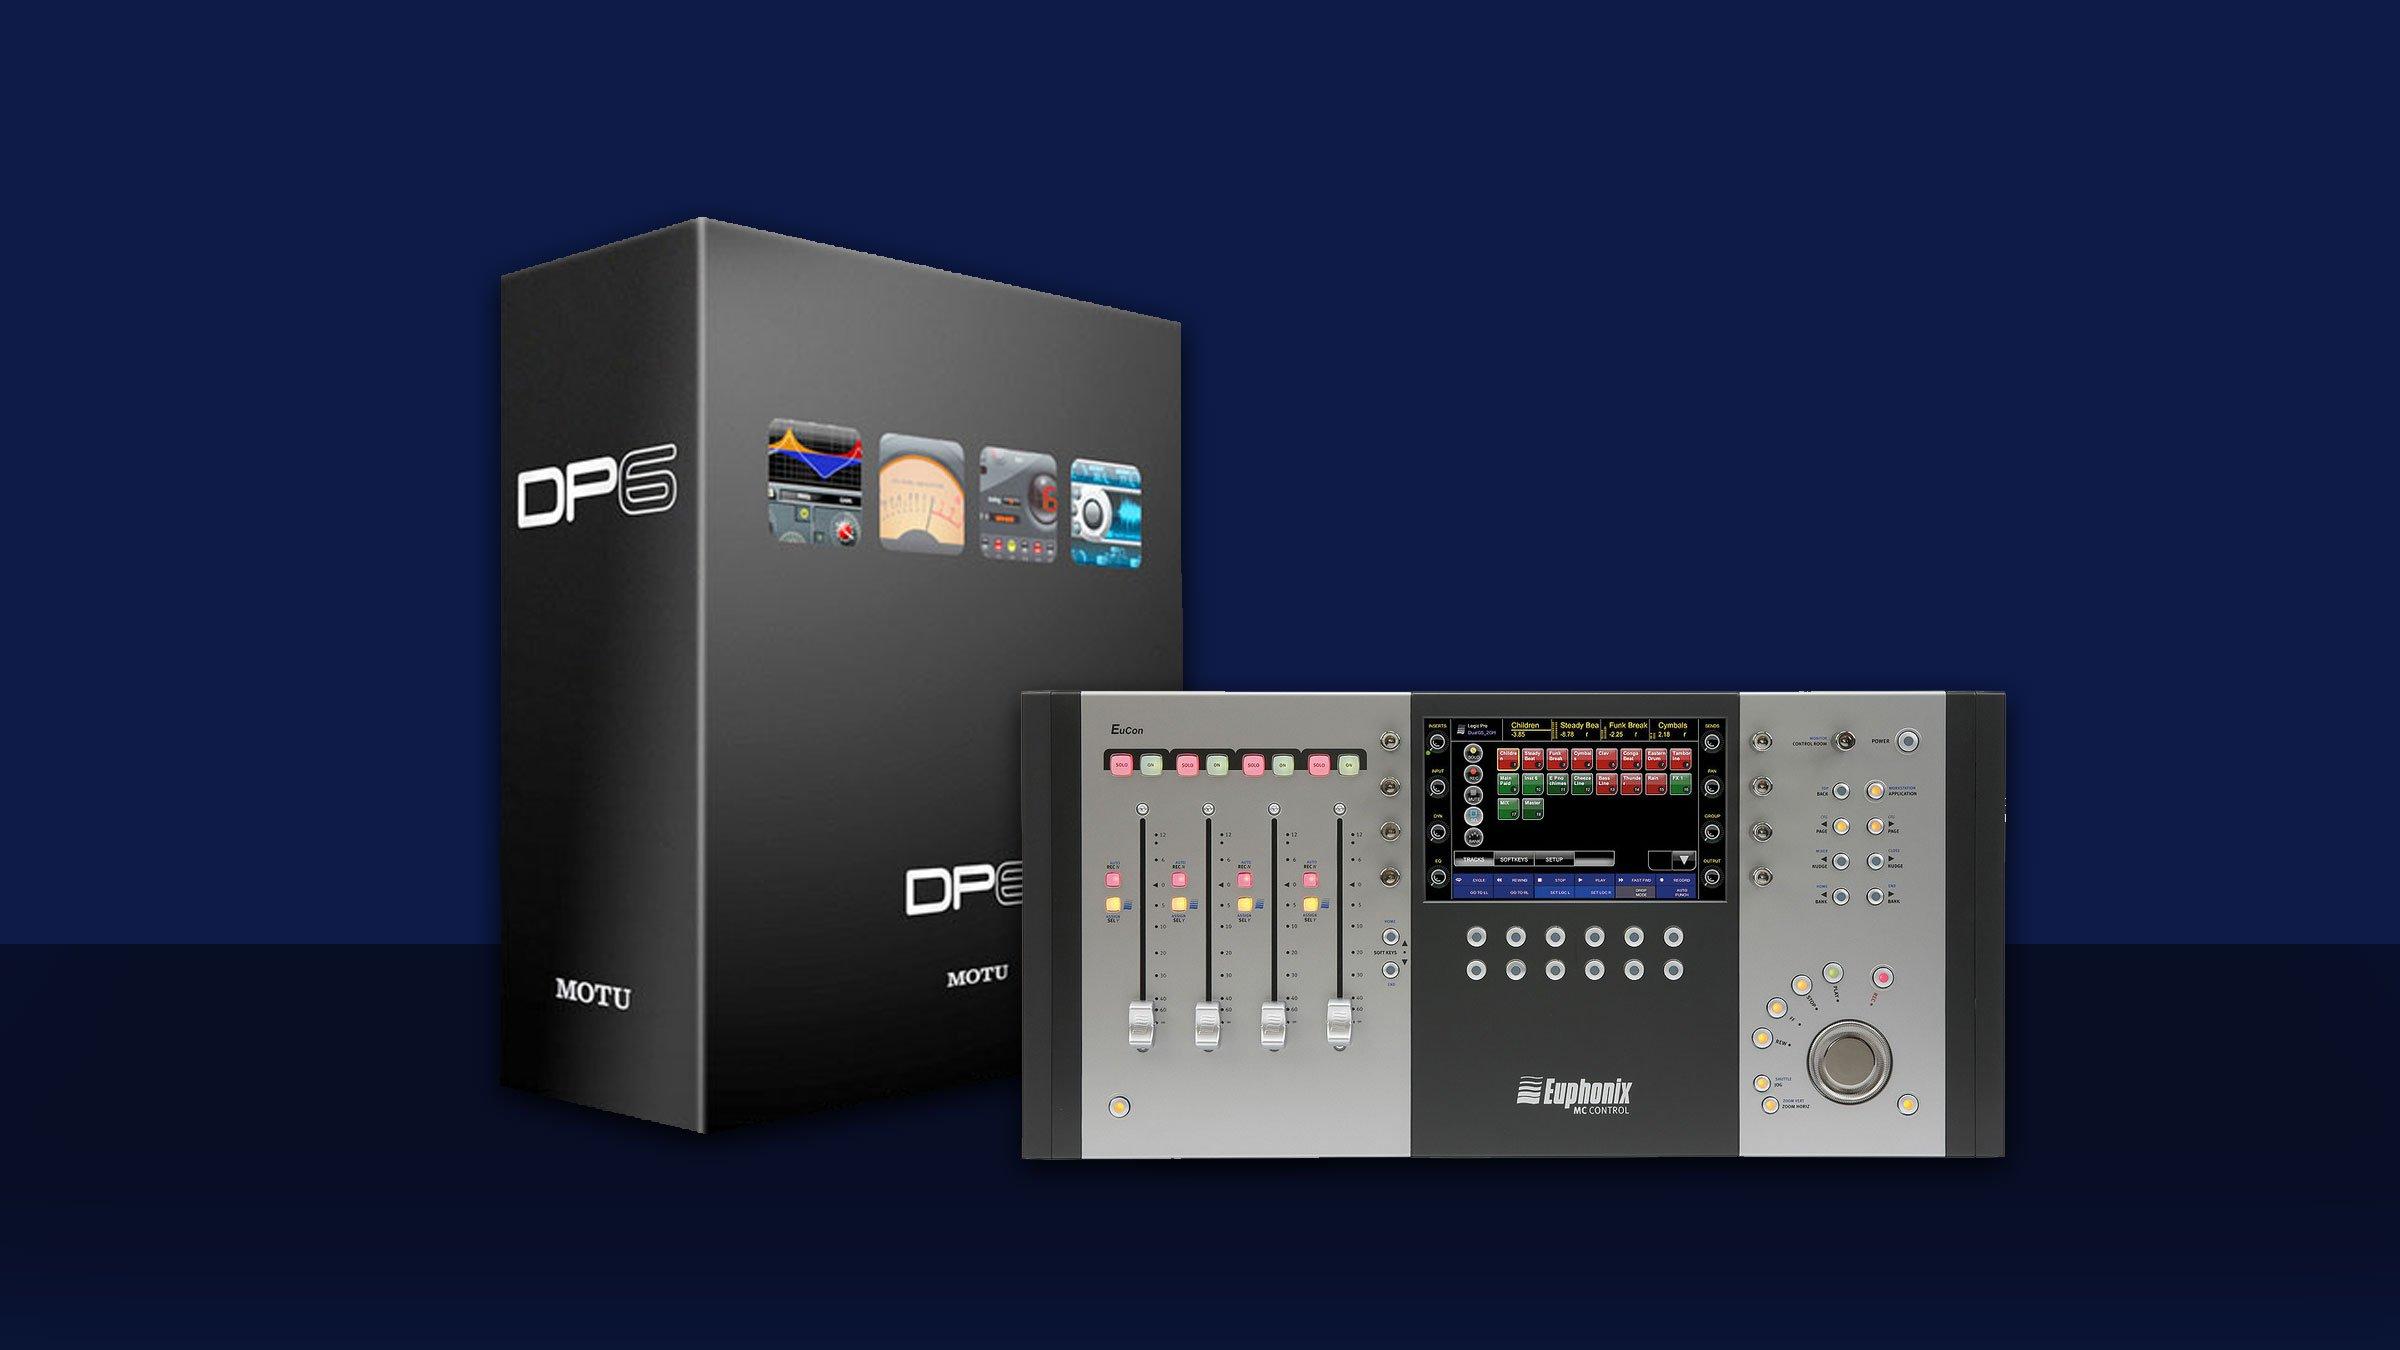 New high-end console technology for DP6 | News | MOTU com